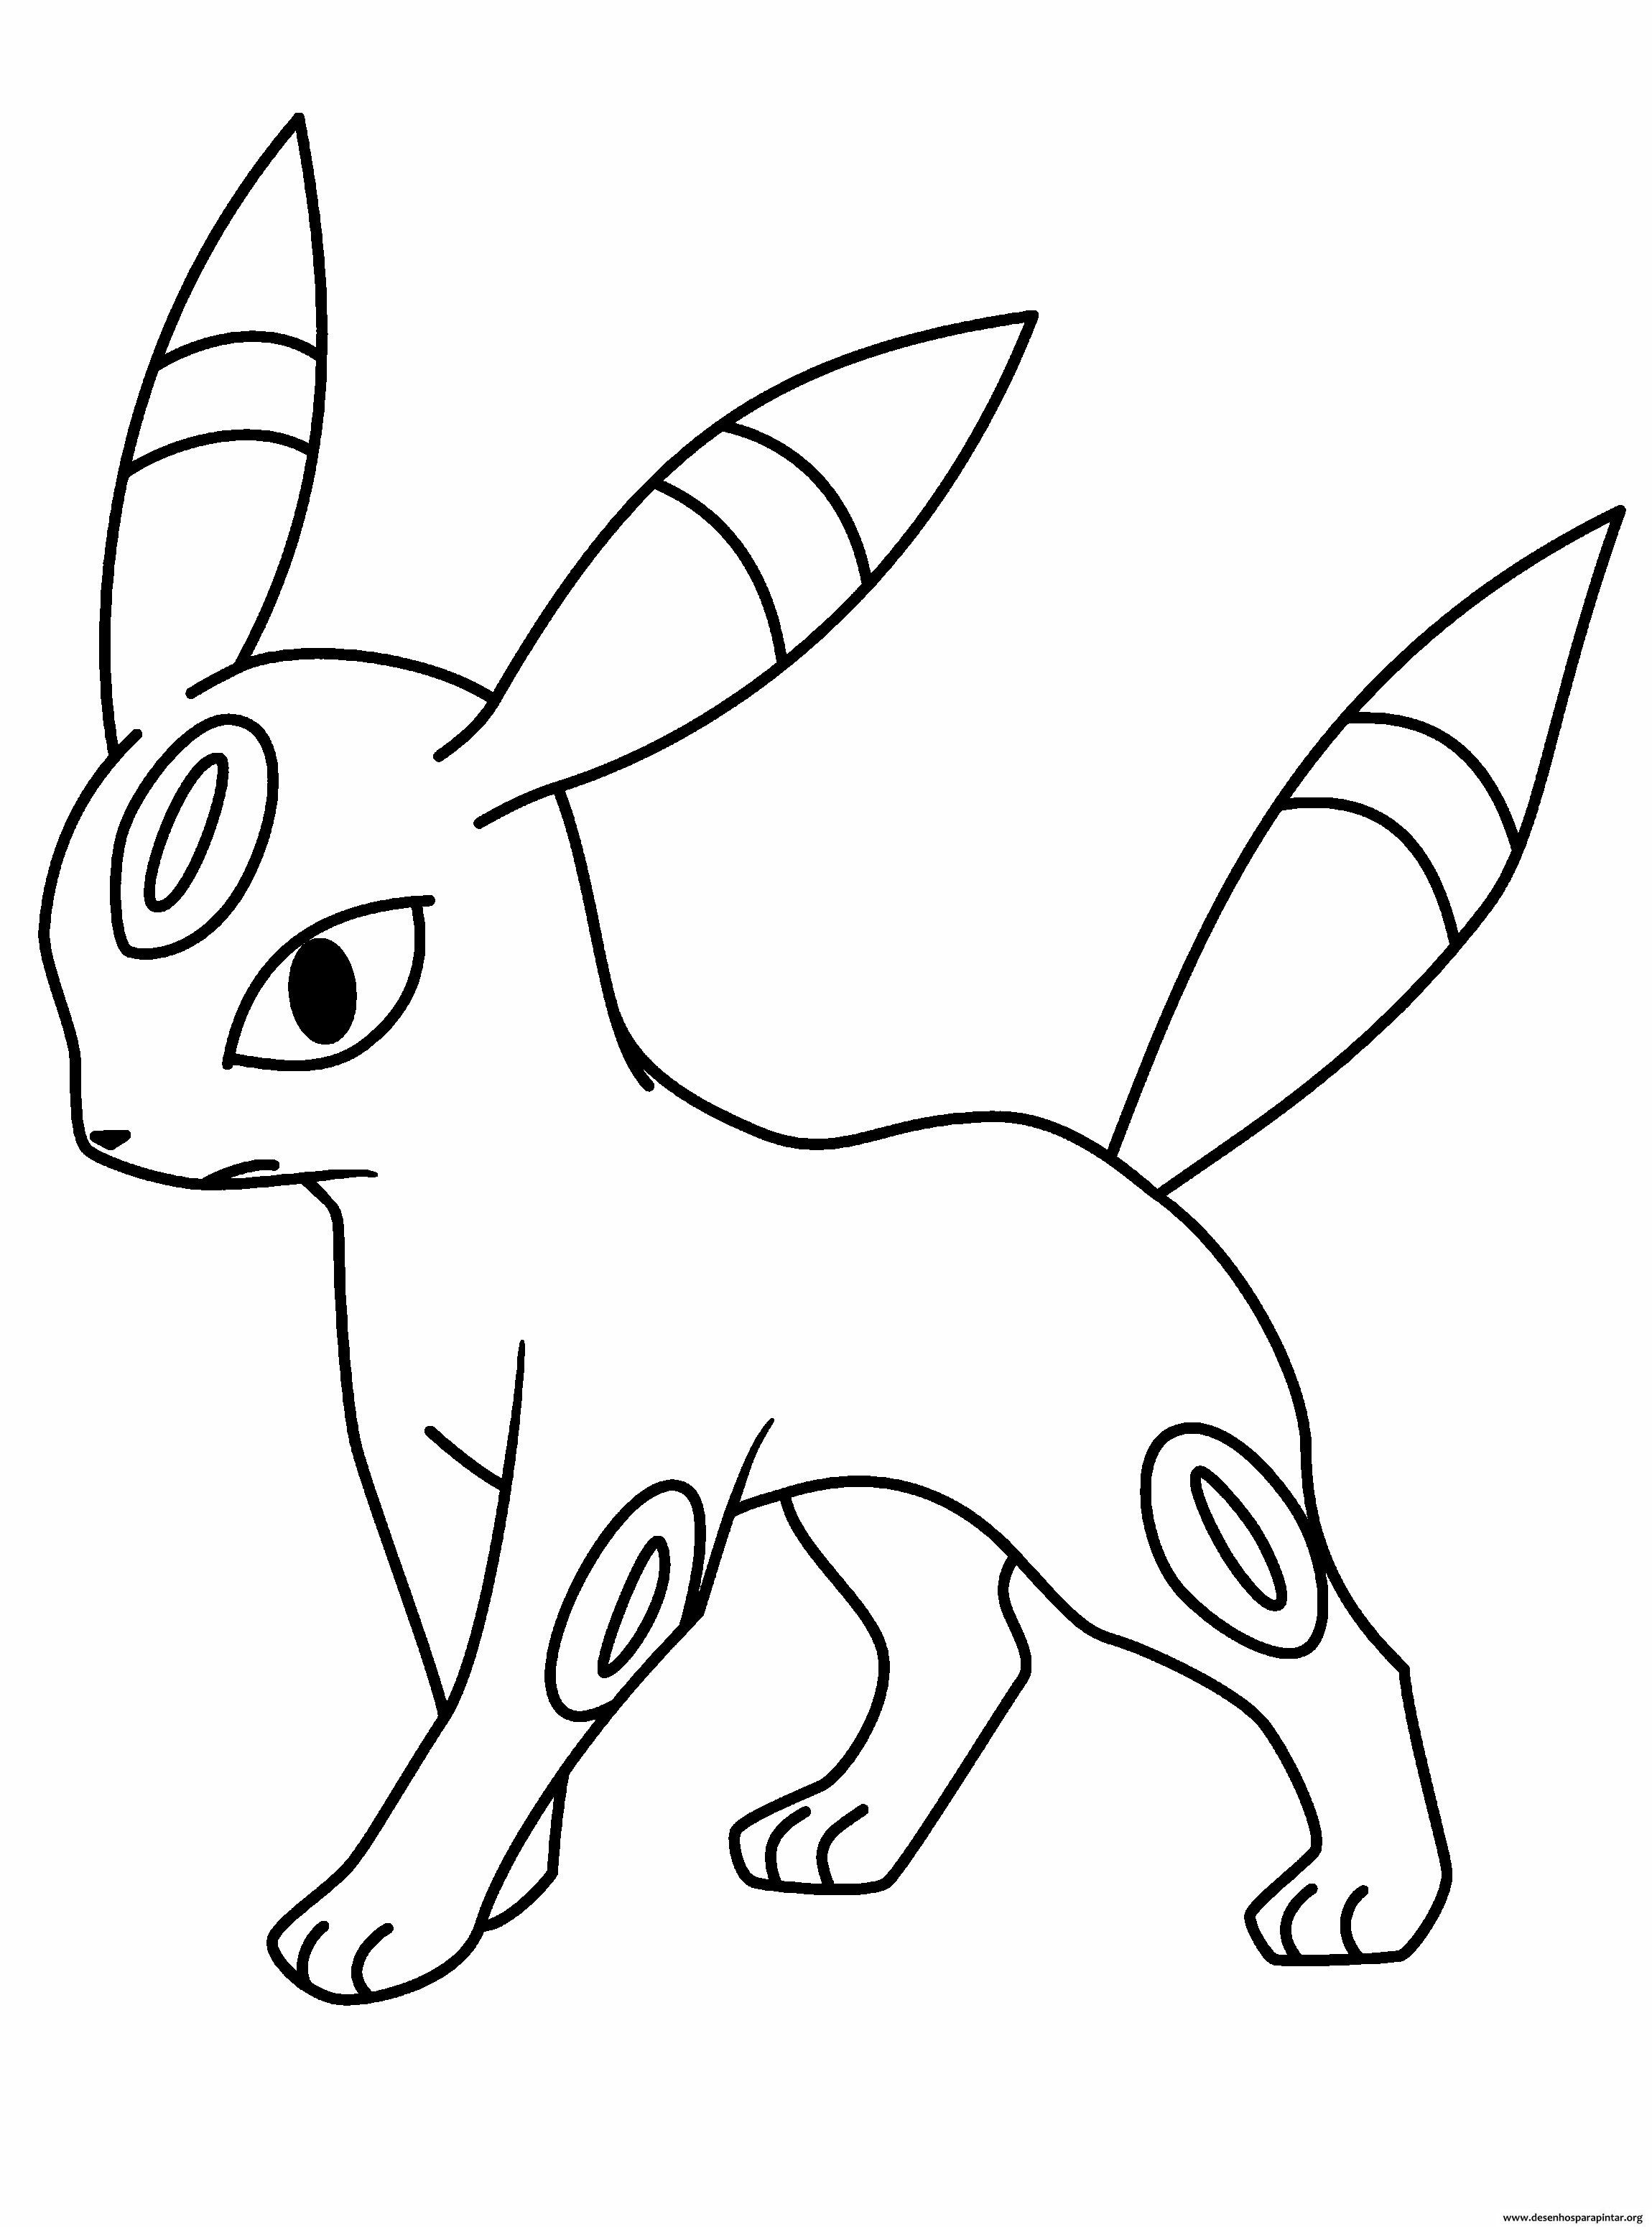 início desenhos para colorir do pokemon lendarios para imprimir